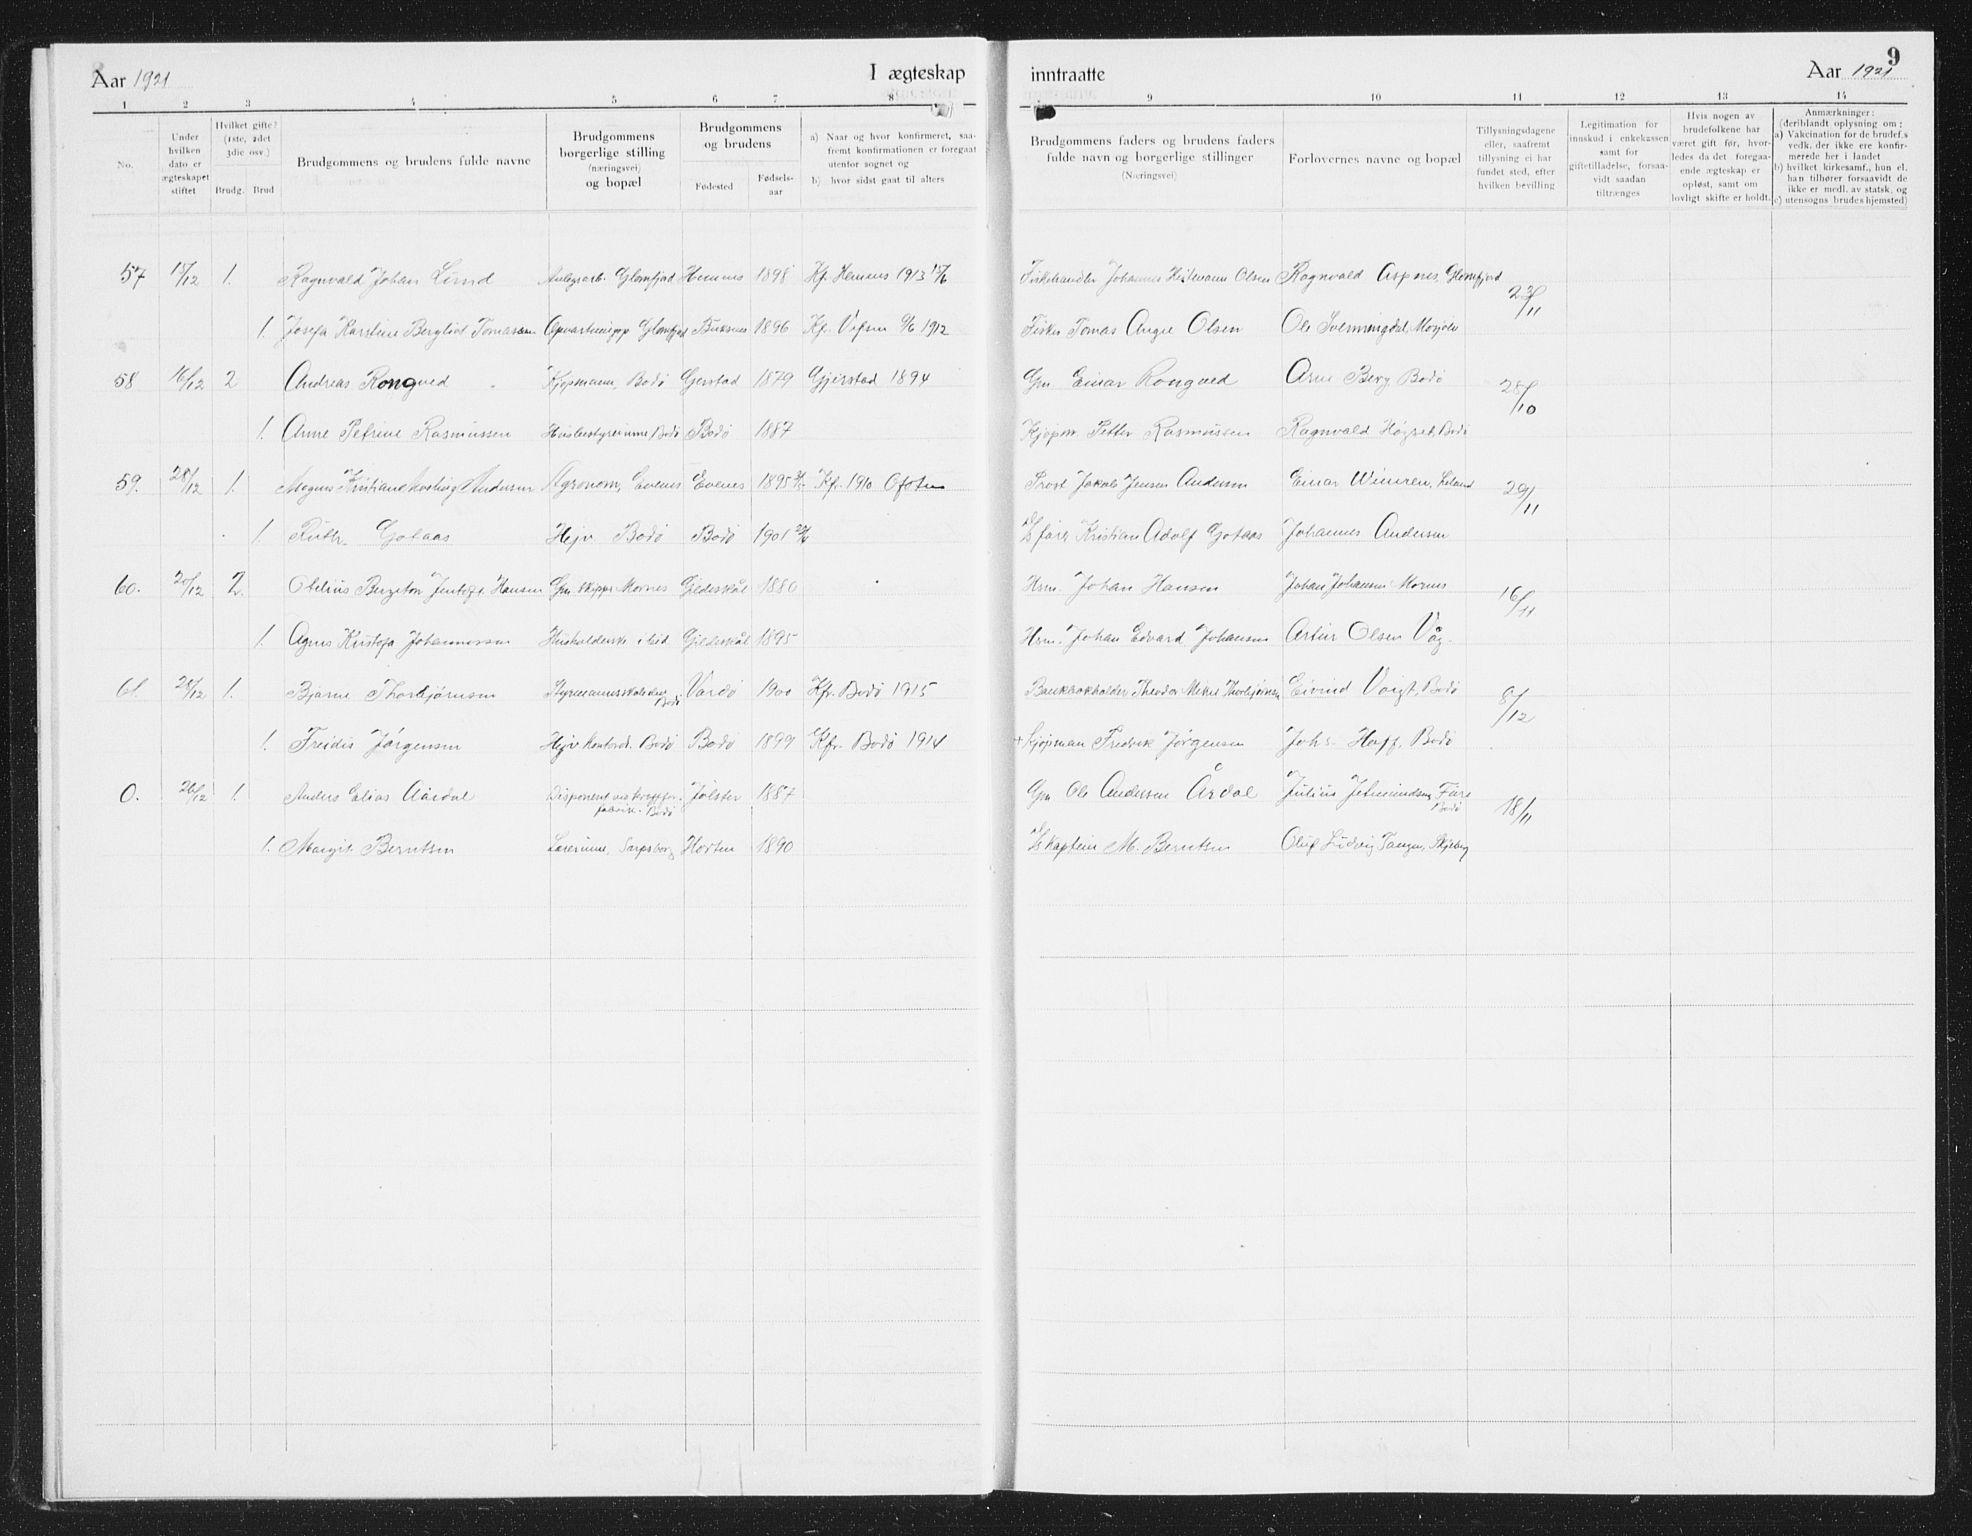 SAT, Ministerialprotokoller, klokkerbøker og fødselsregistre - Nordland, 801/L0036: Klokkerbok nr. 801C11, 1920-1934, s. 9